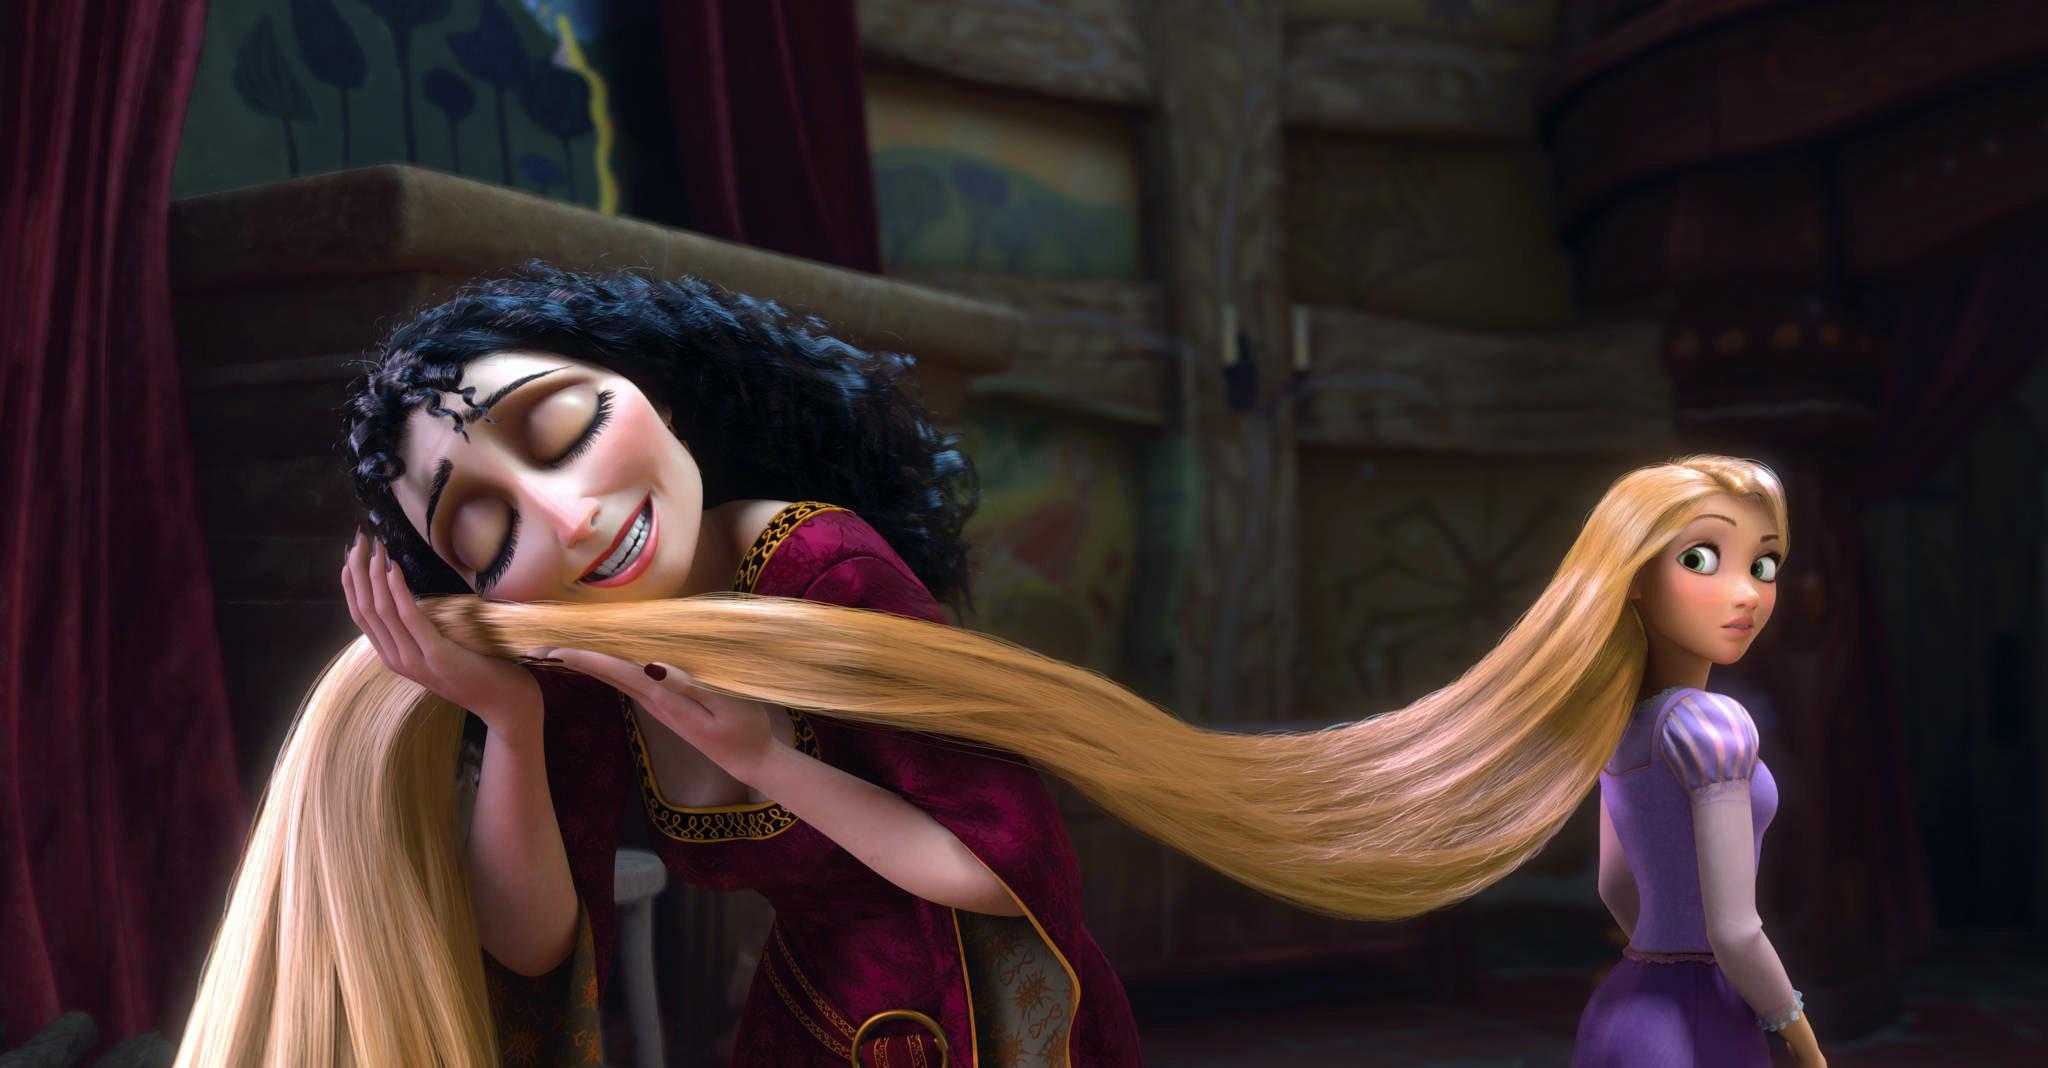 Mother Gothel rubs Rapunzel's hair against her face